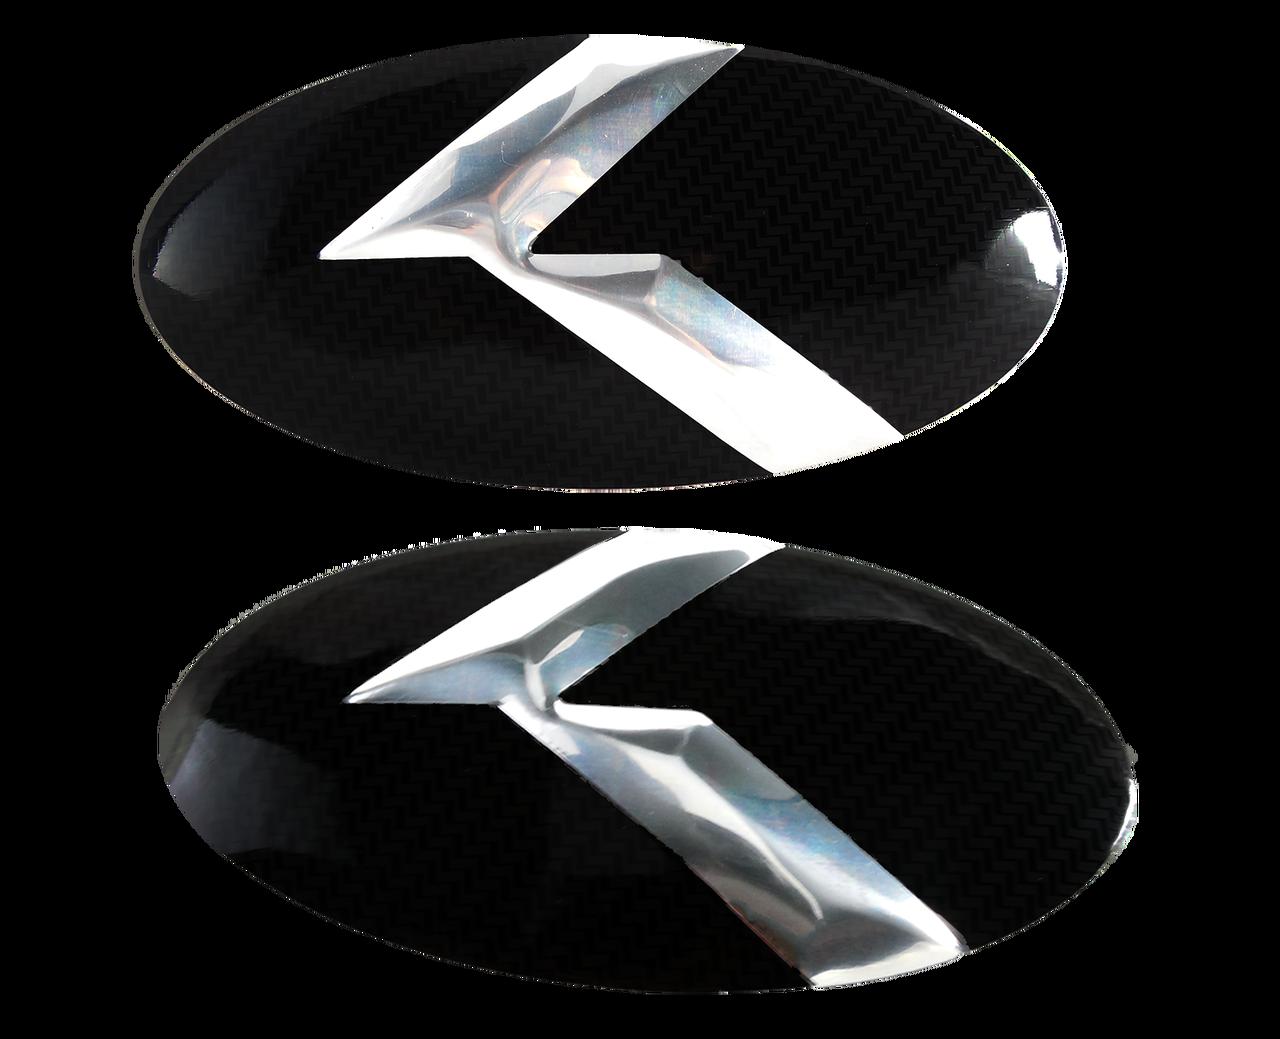 emblems badge black change kia new steering wheel aftermarket emblem optima logo